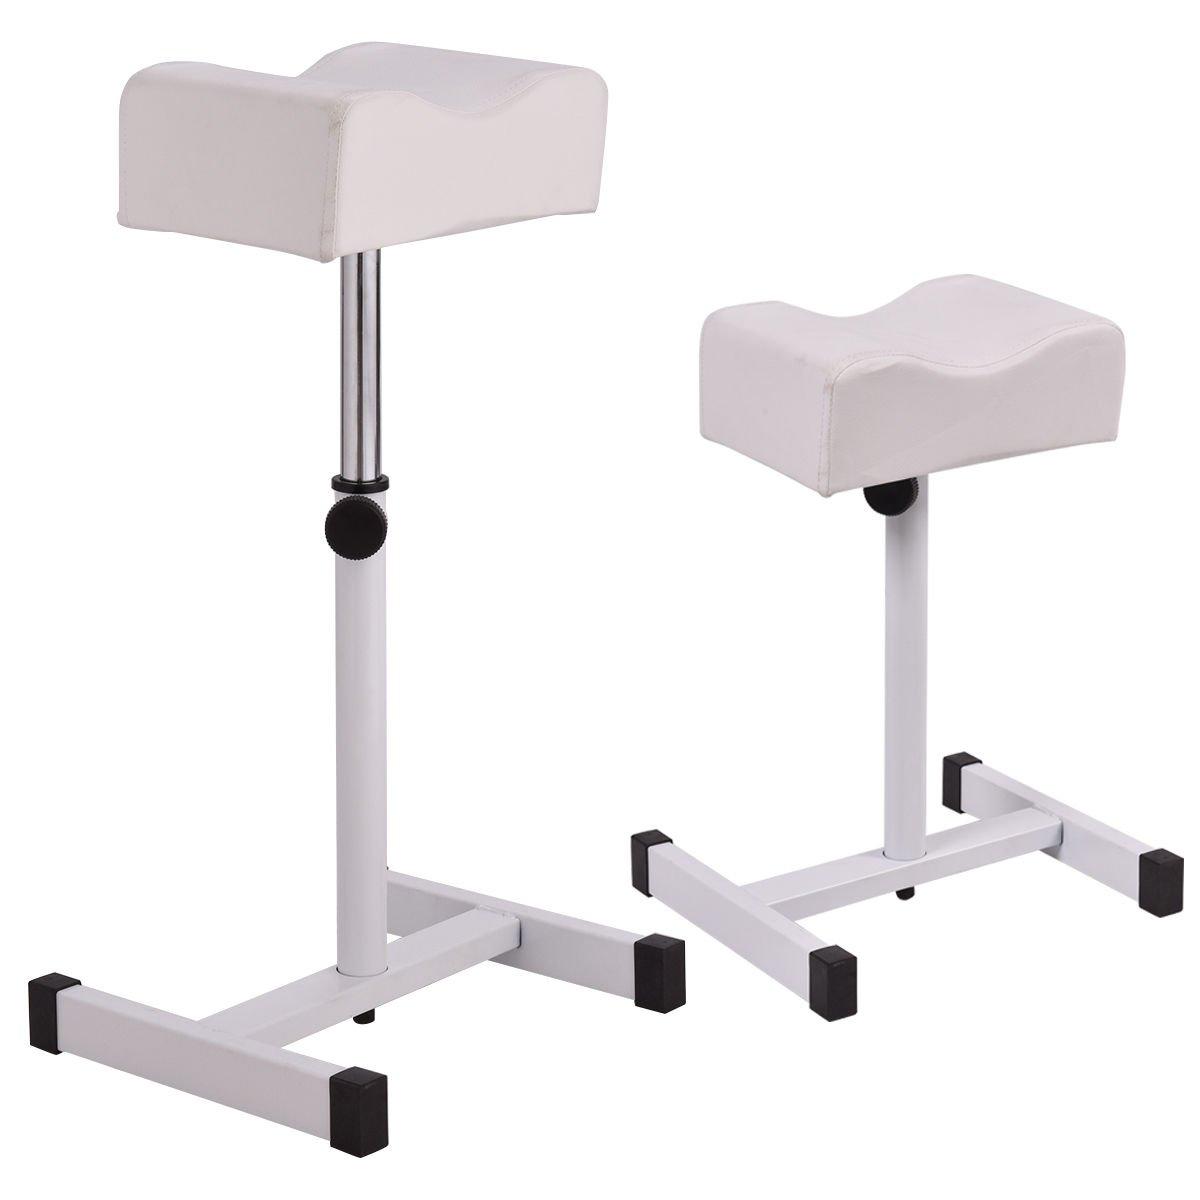 Simply Silver - Adjustable Pedicure - White Adjustable Pedicure Manicure Technician Nail Footrest Salon Spa Equipment